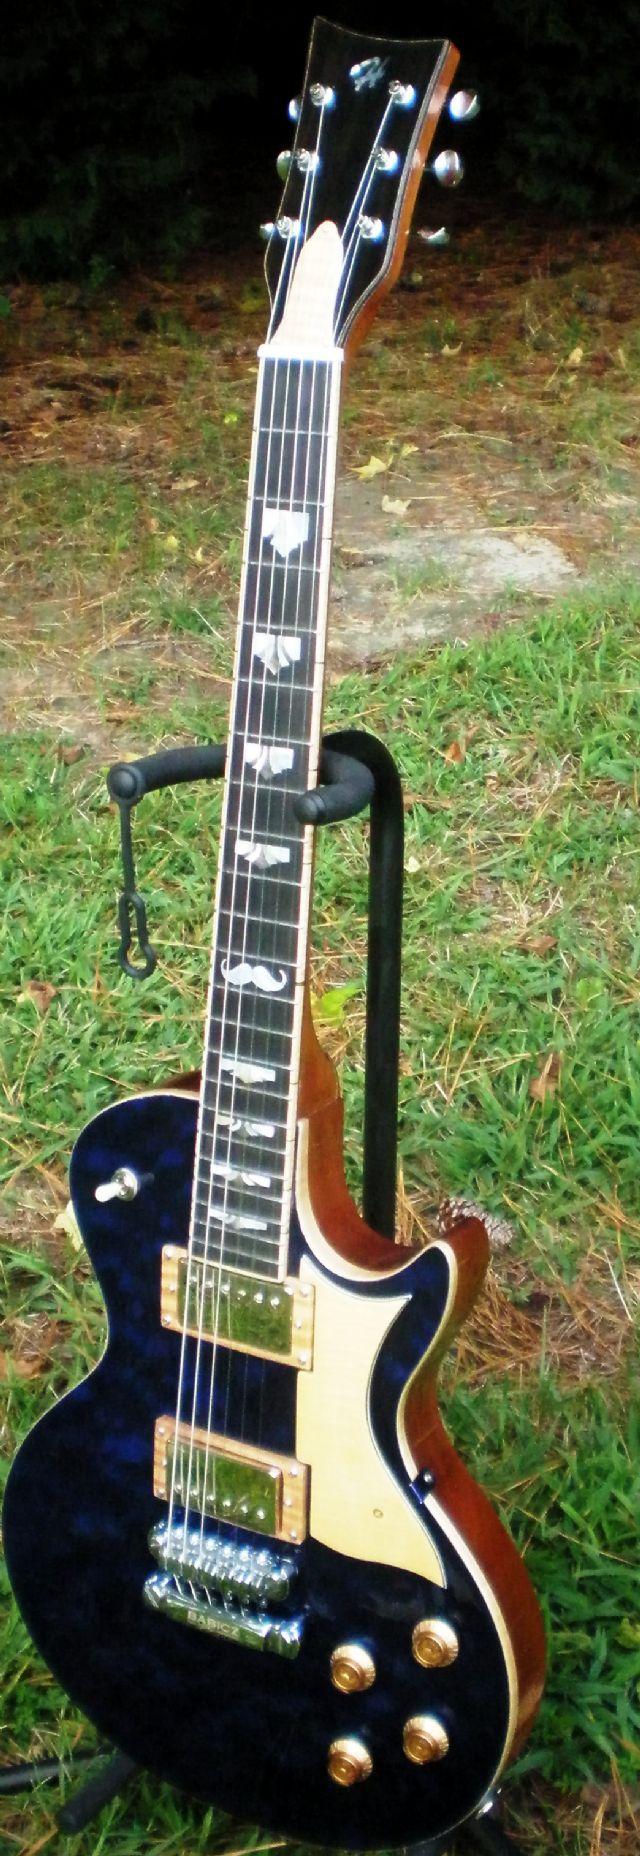 musical instruments for sale in virginia beach va clazorg